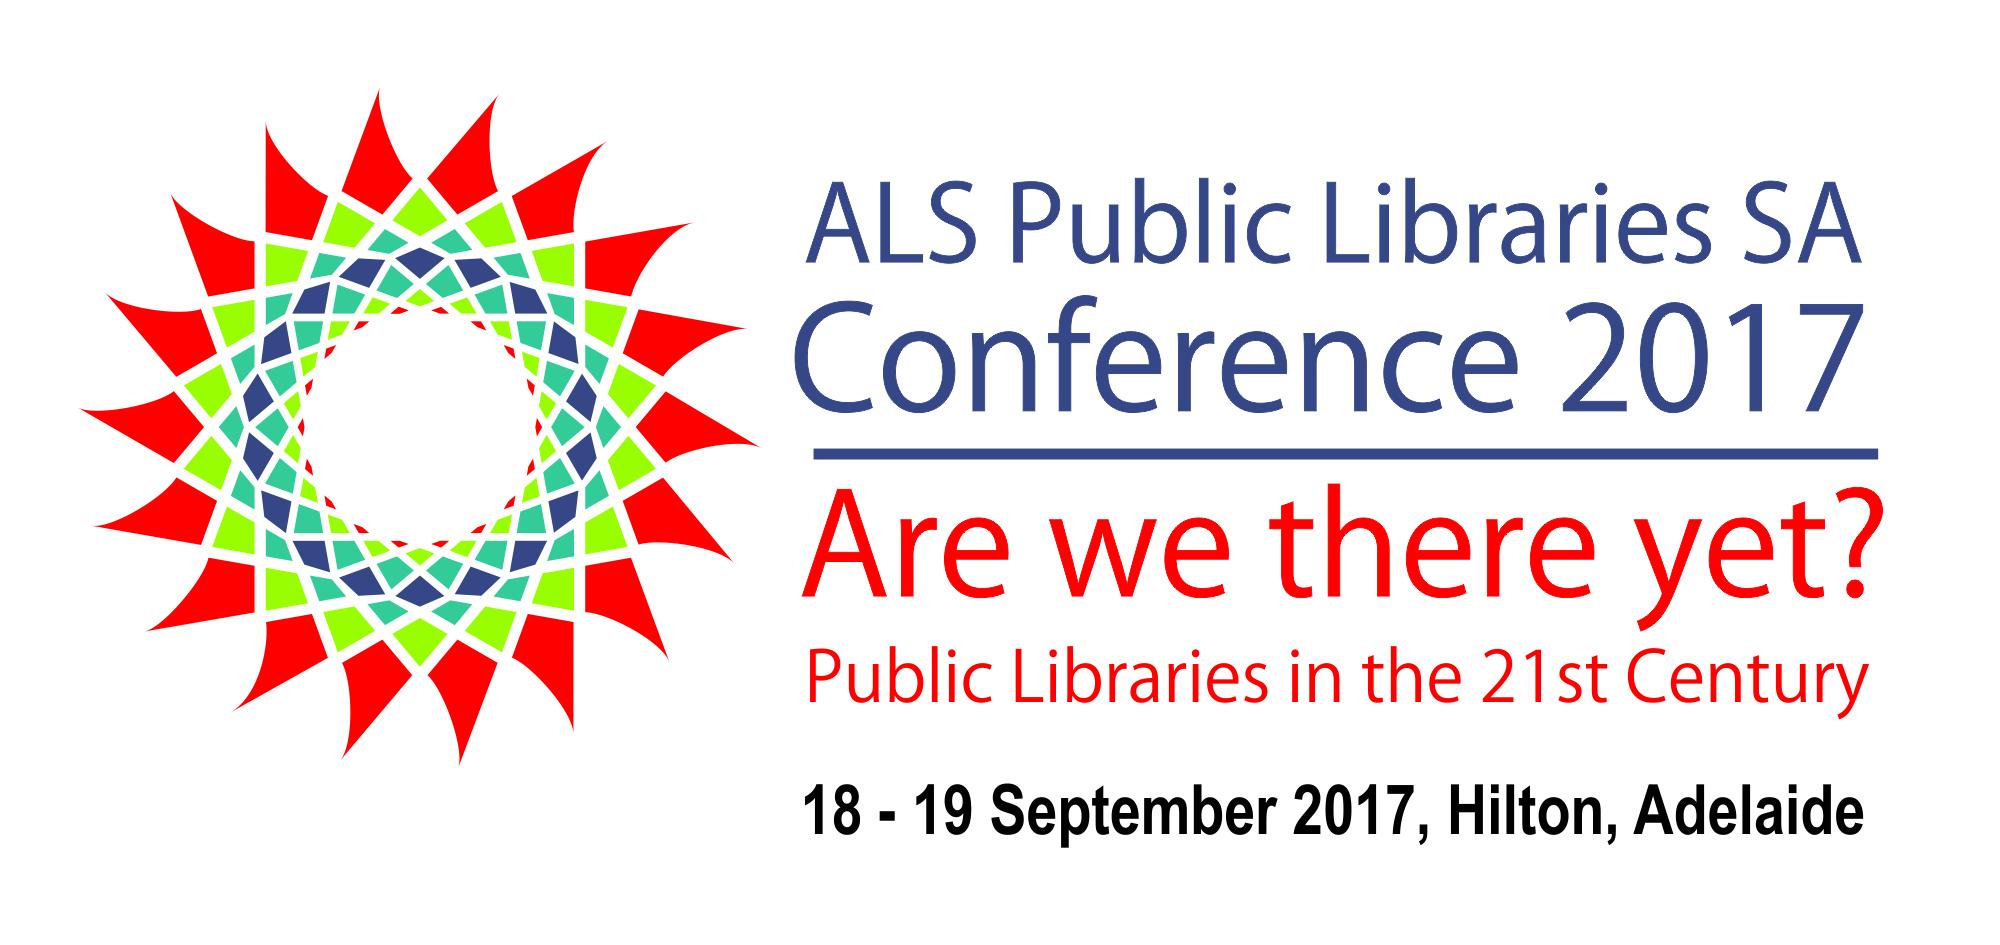 PLSA Conference 2017